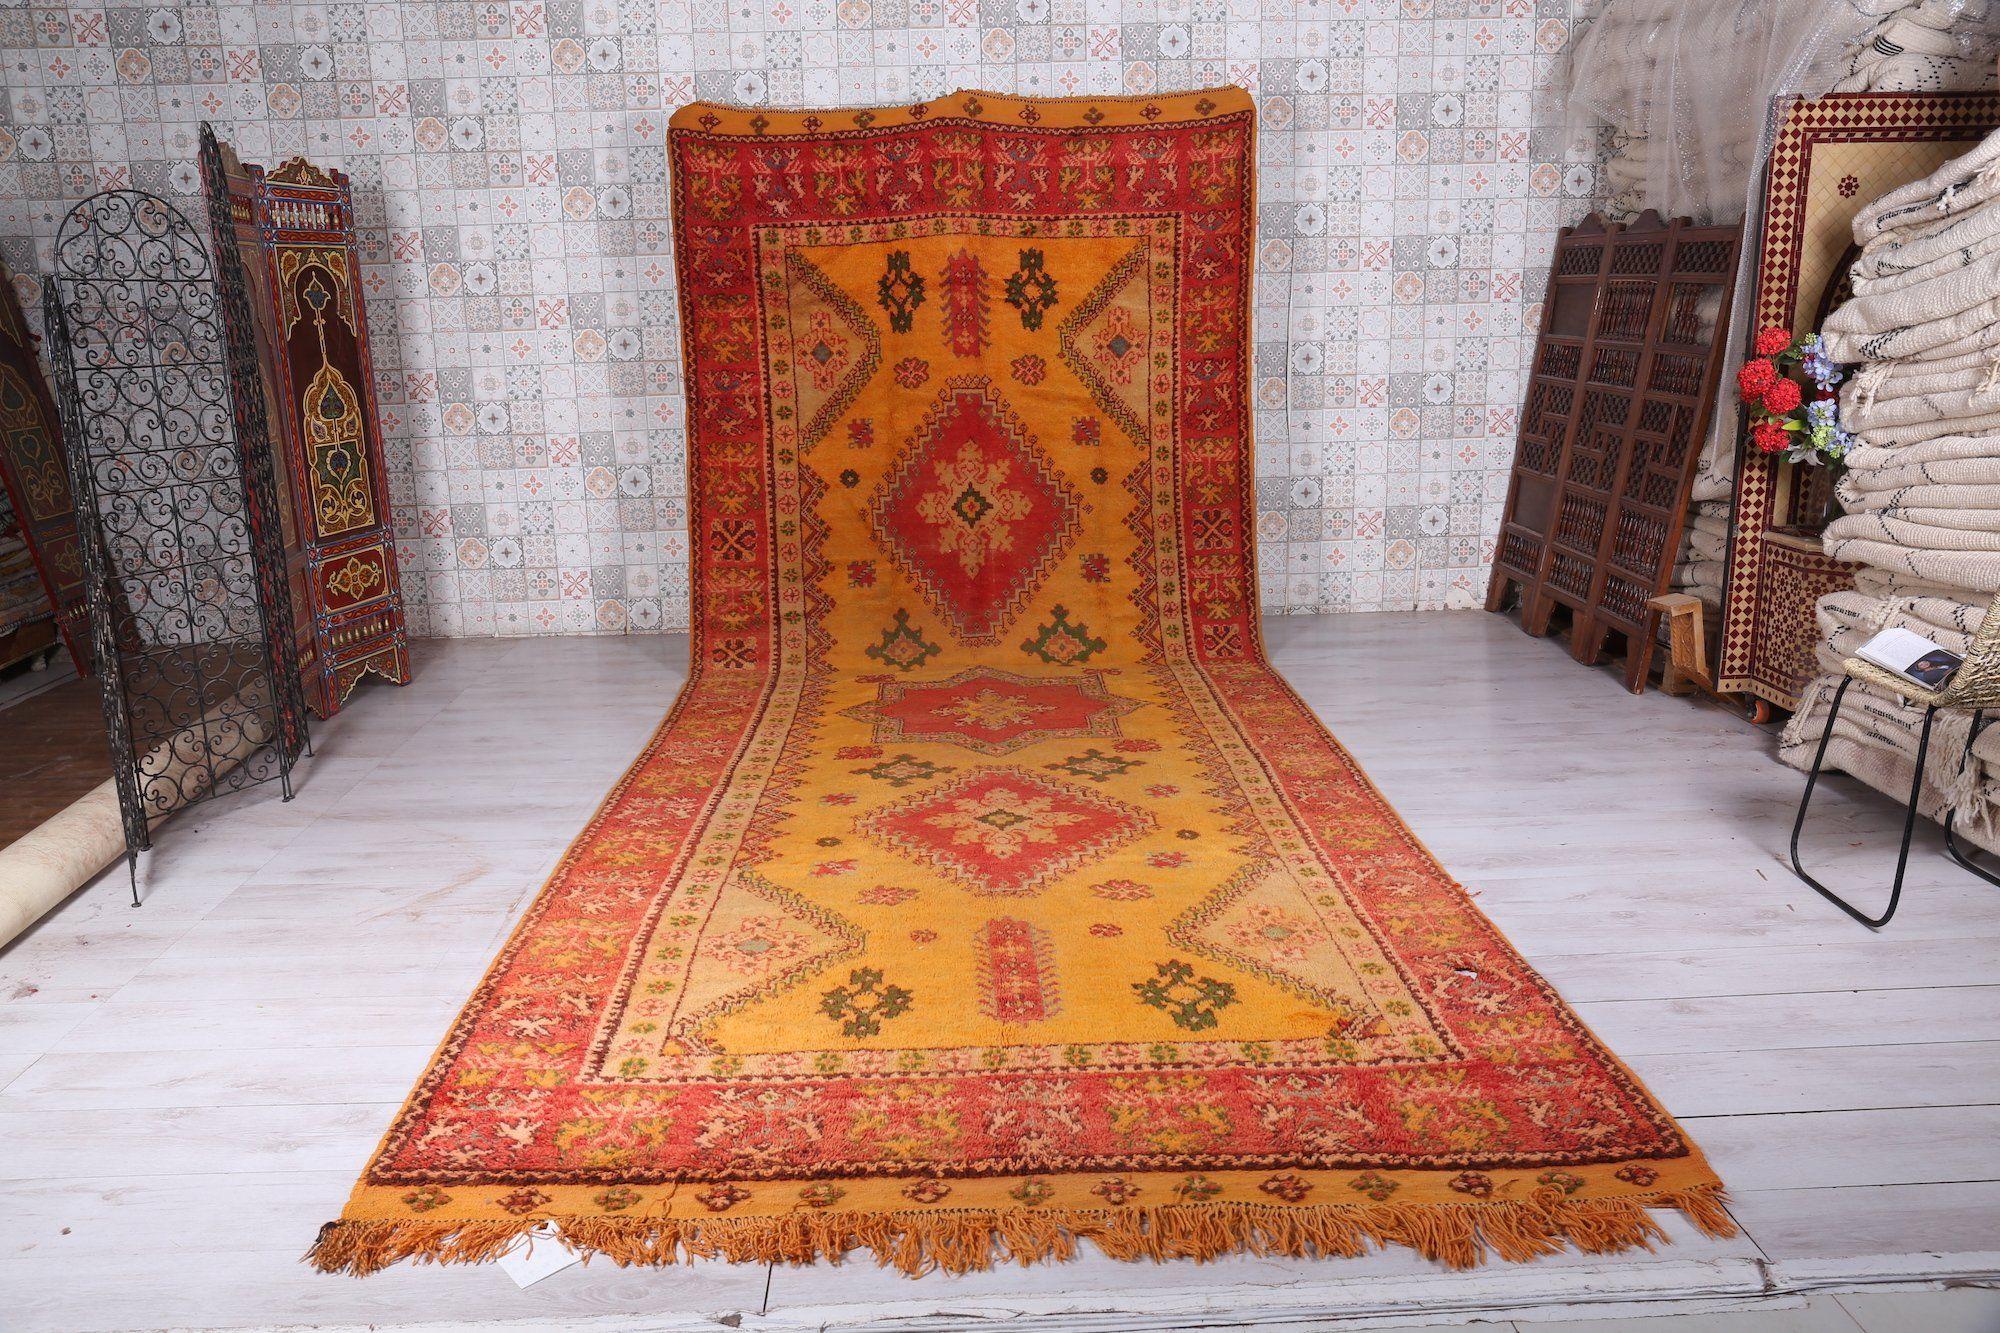 Runner Moroccan rug, 6.7 FT X 16.6 FT  #rug #berber #handmade #antique #ourain #gift #handwoven #boucherouite #carpet #decoration